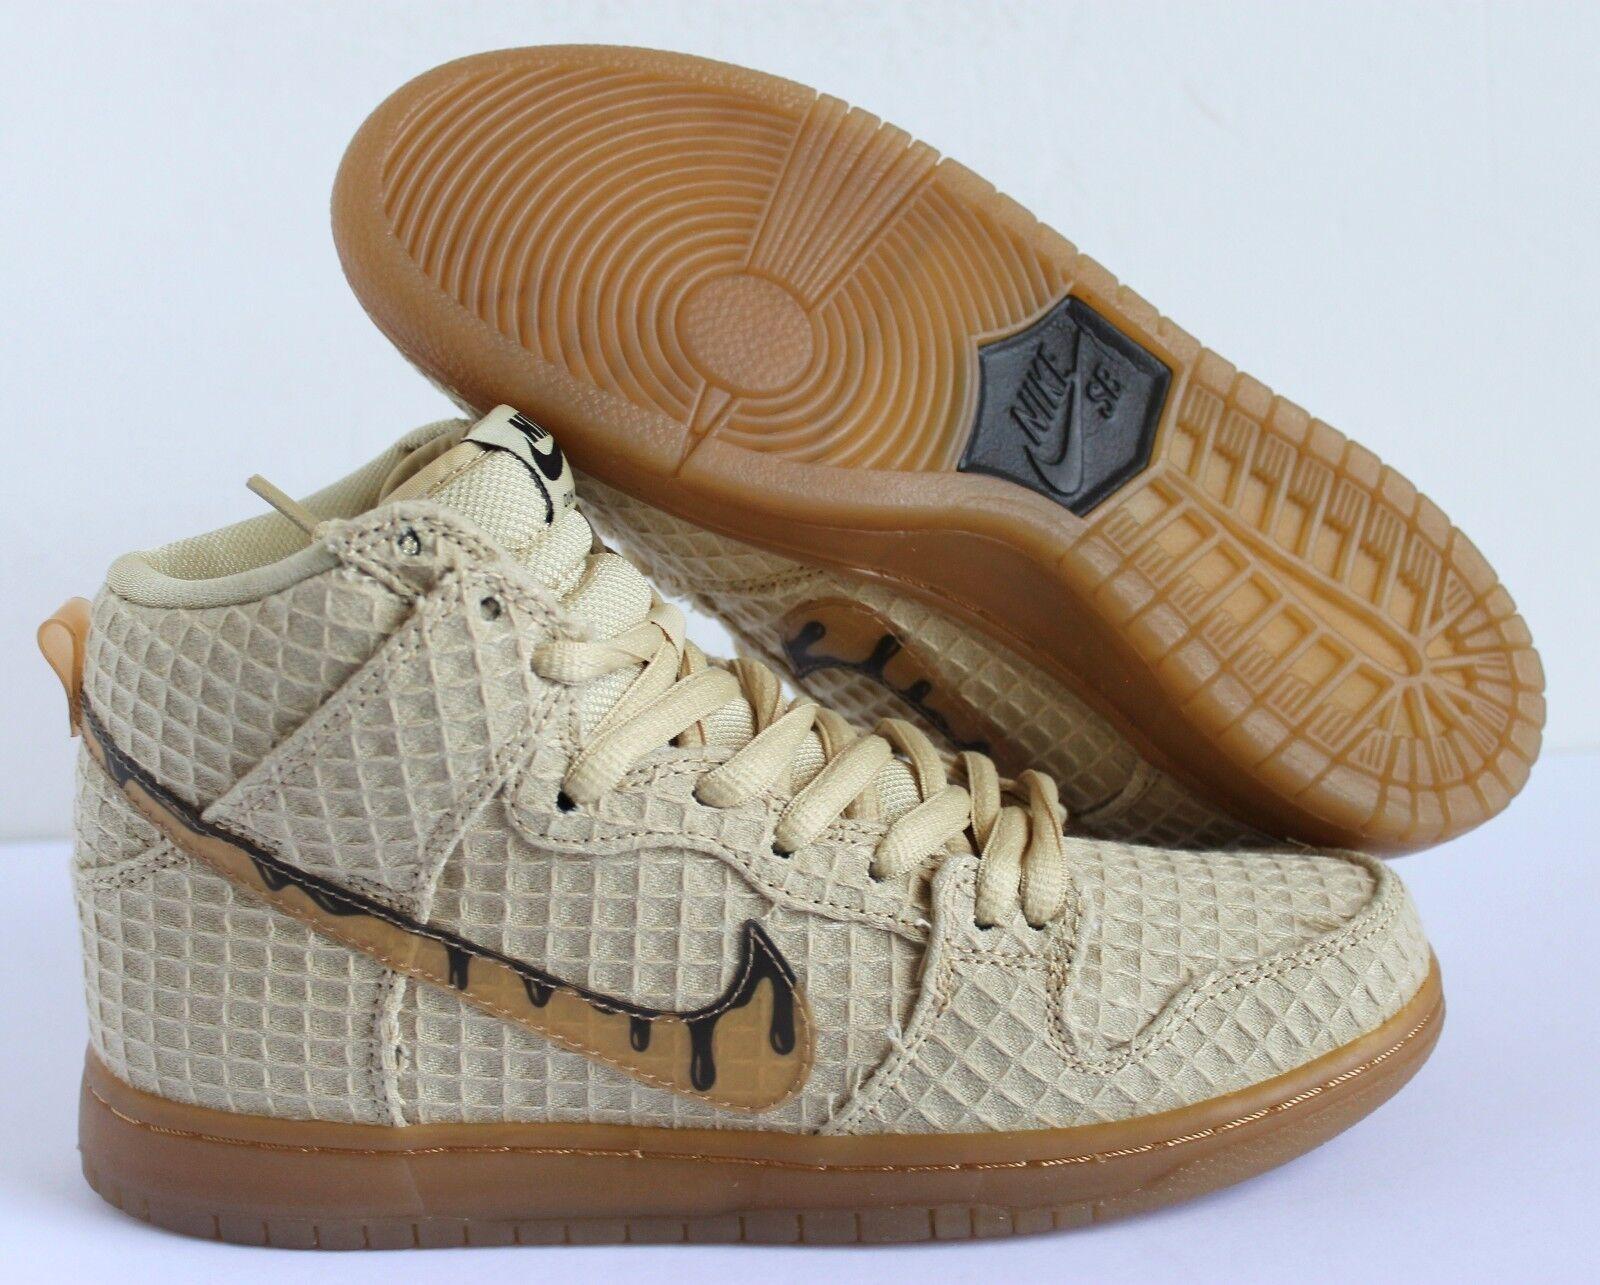 Nike Dunk High Premium SB Chicken Waffles & Waffles Chicken Gold & Brown Sz 7 NEW 313171 722 c72ec2